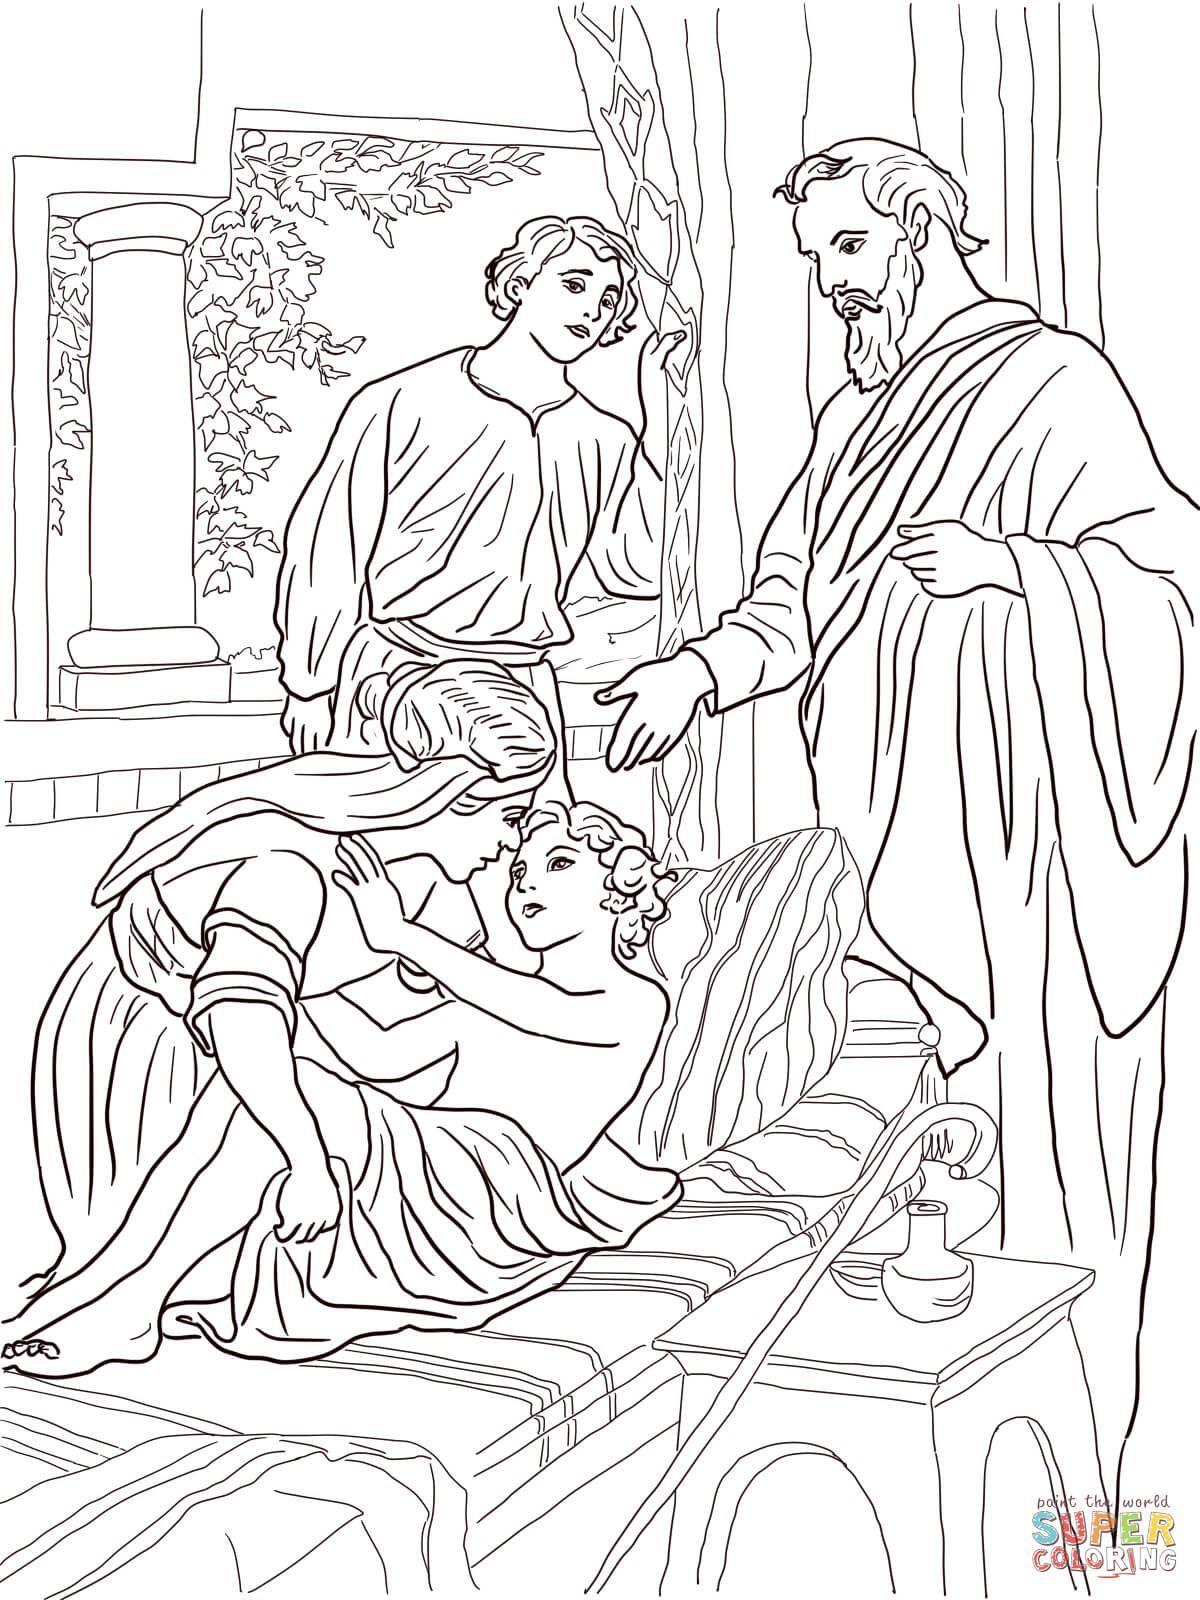 Elisha And The Shunammite Woman Coloring Page Free